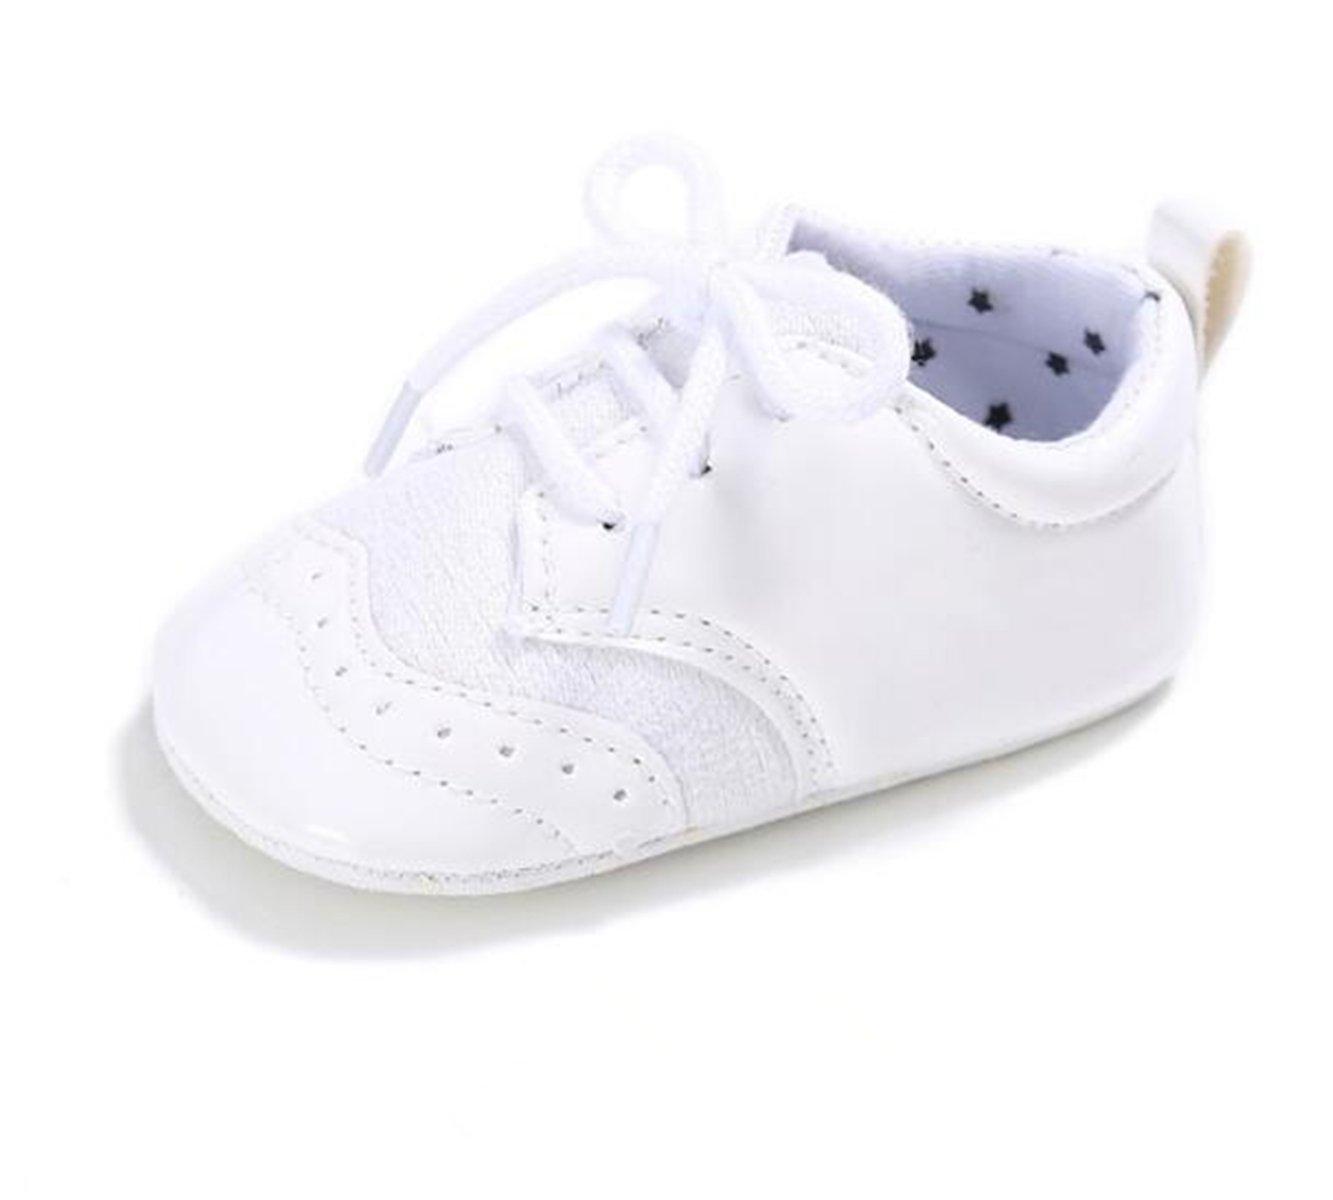 C& H Unisex Infant Baby Soft Tassels Non-Slip Prewalker Moccasins Shoes